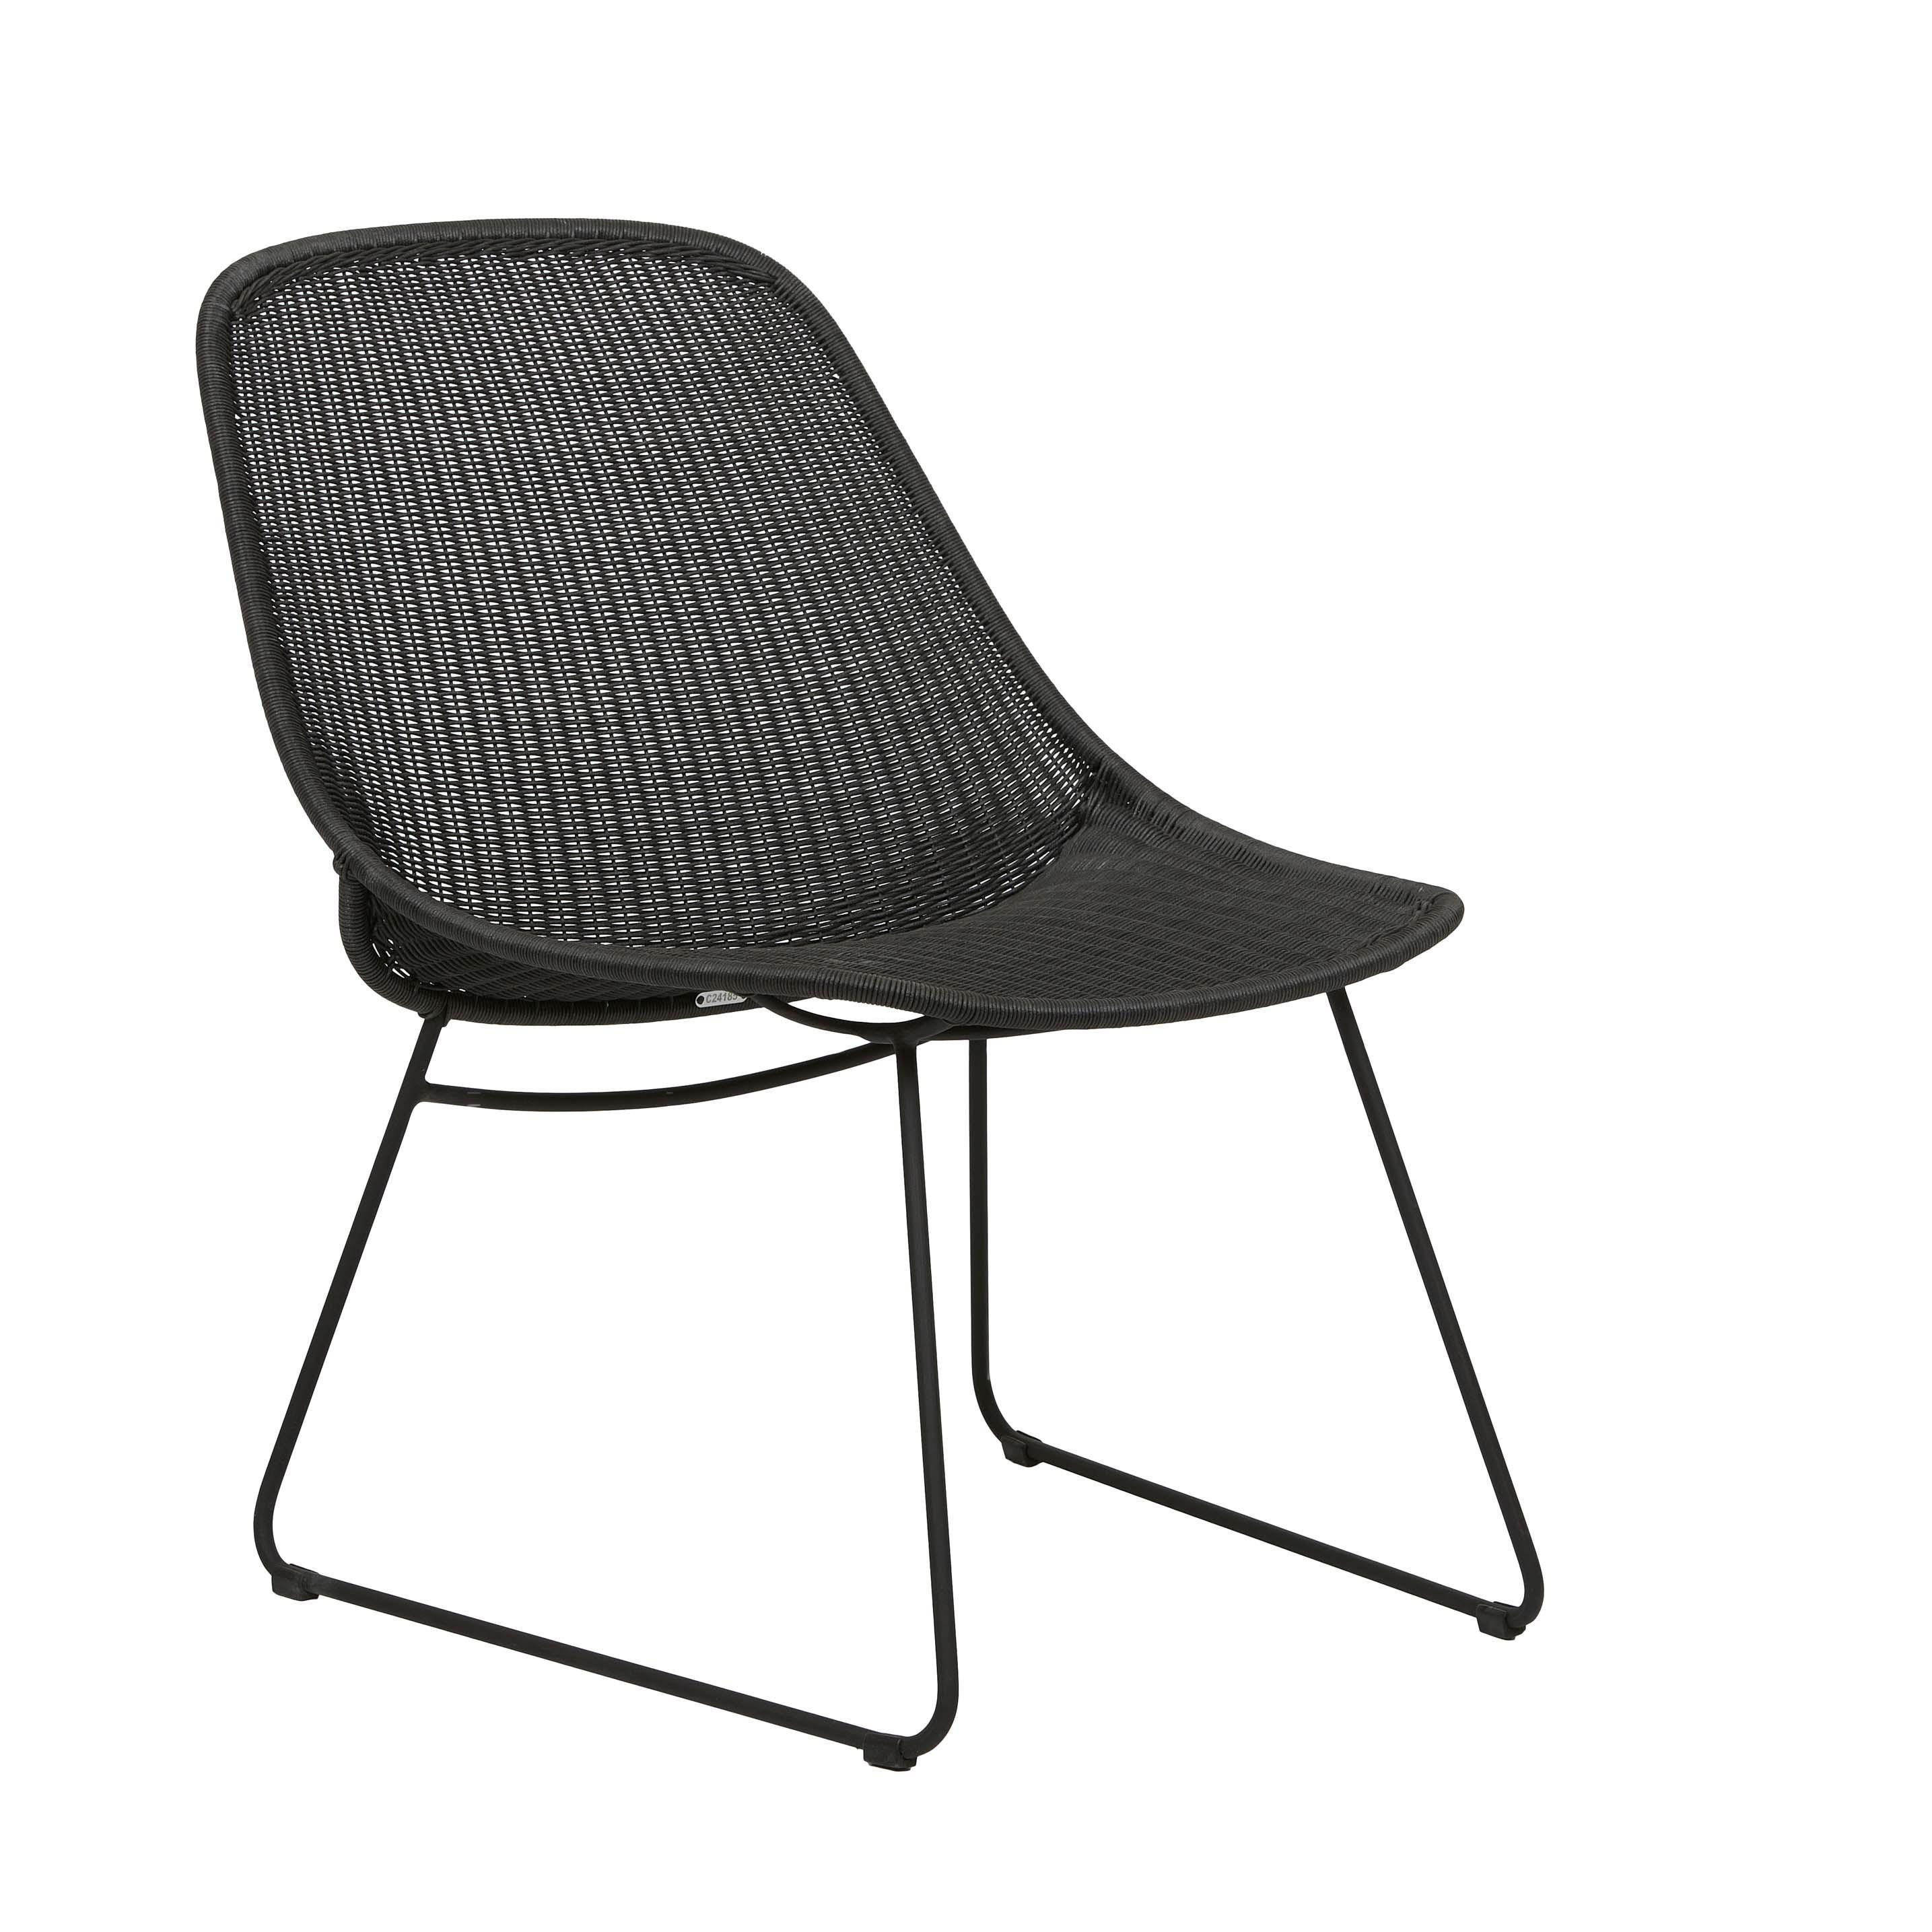 Furniture Hero-Images Occasional-Chairs granada-scoop-closed-weave-03